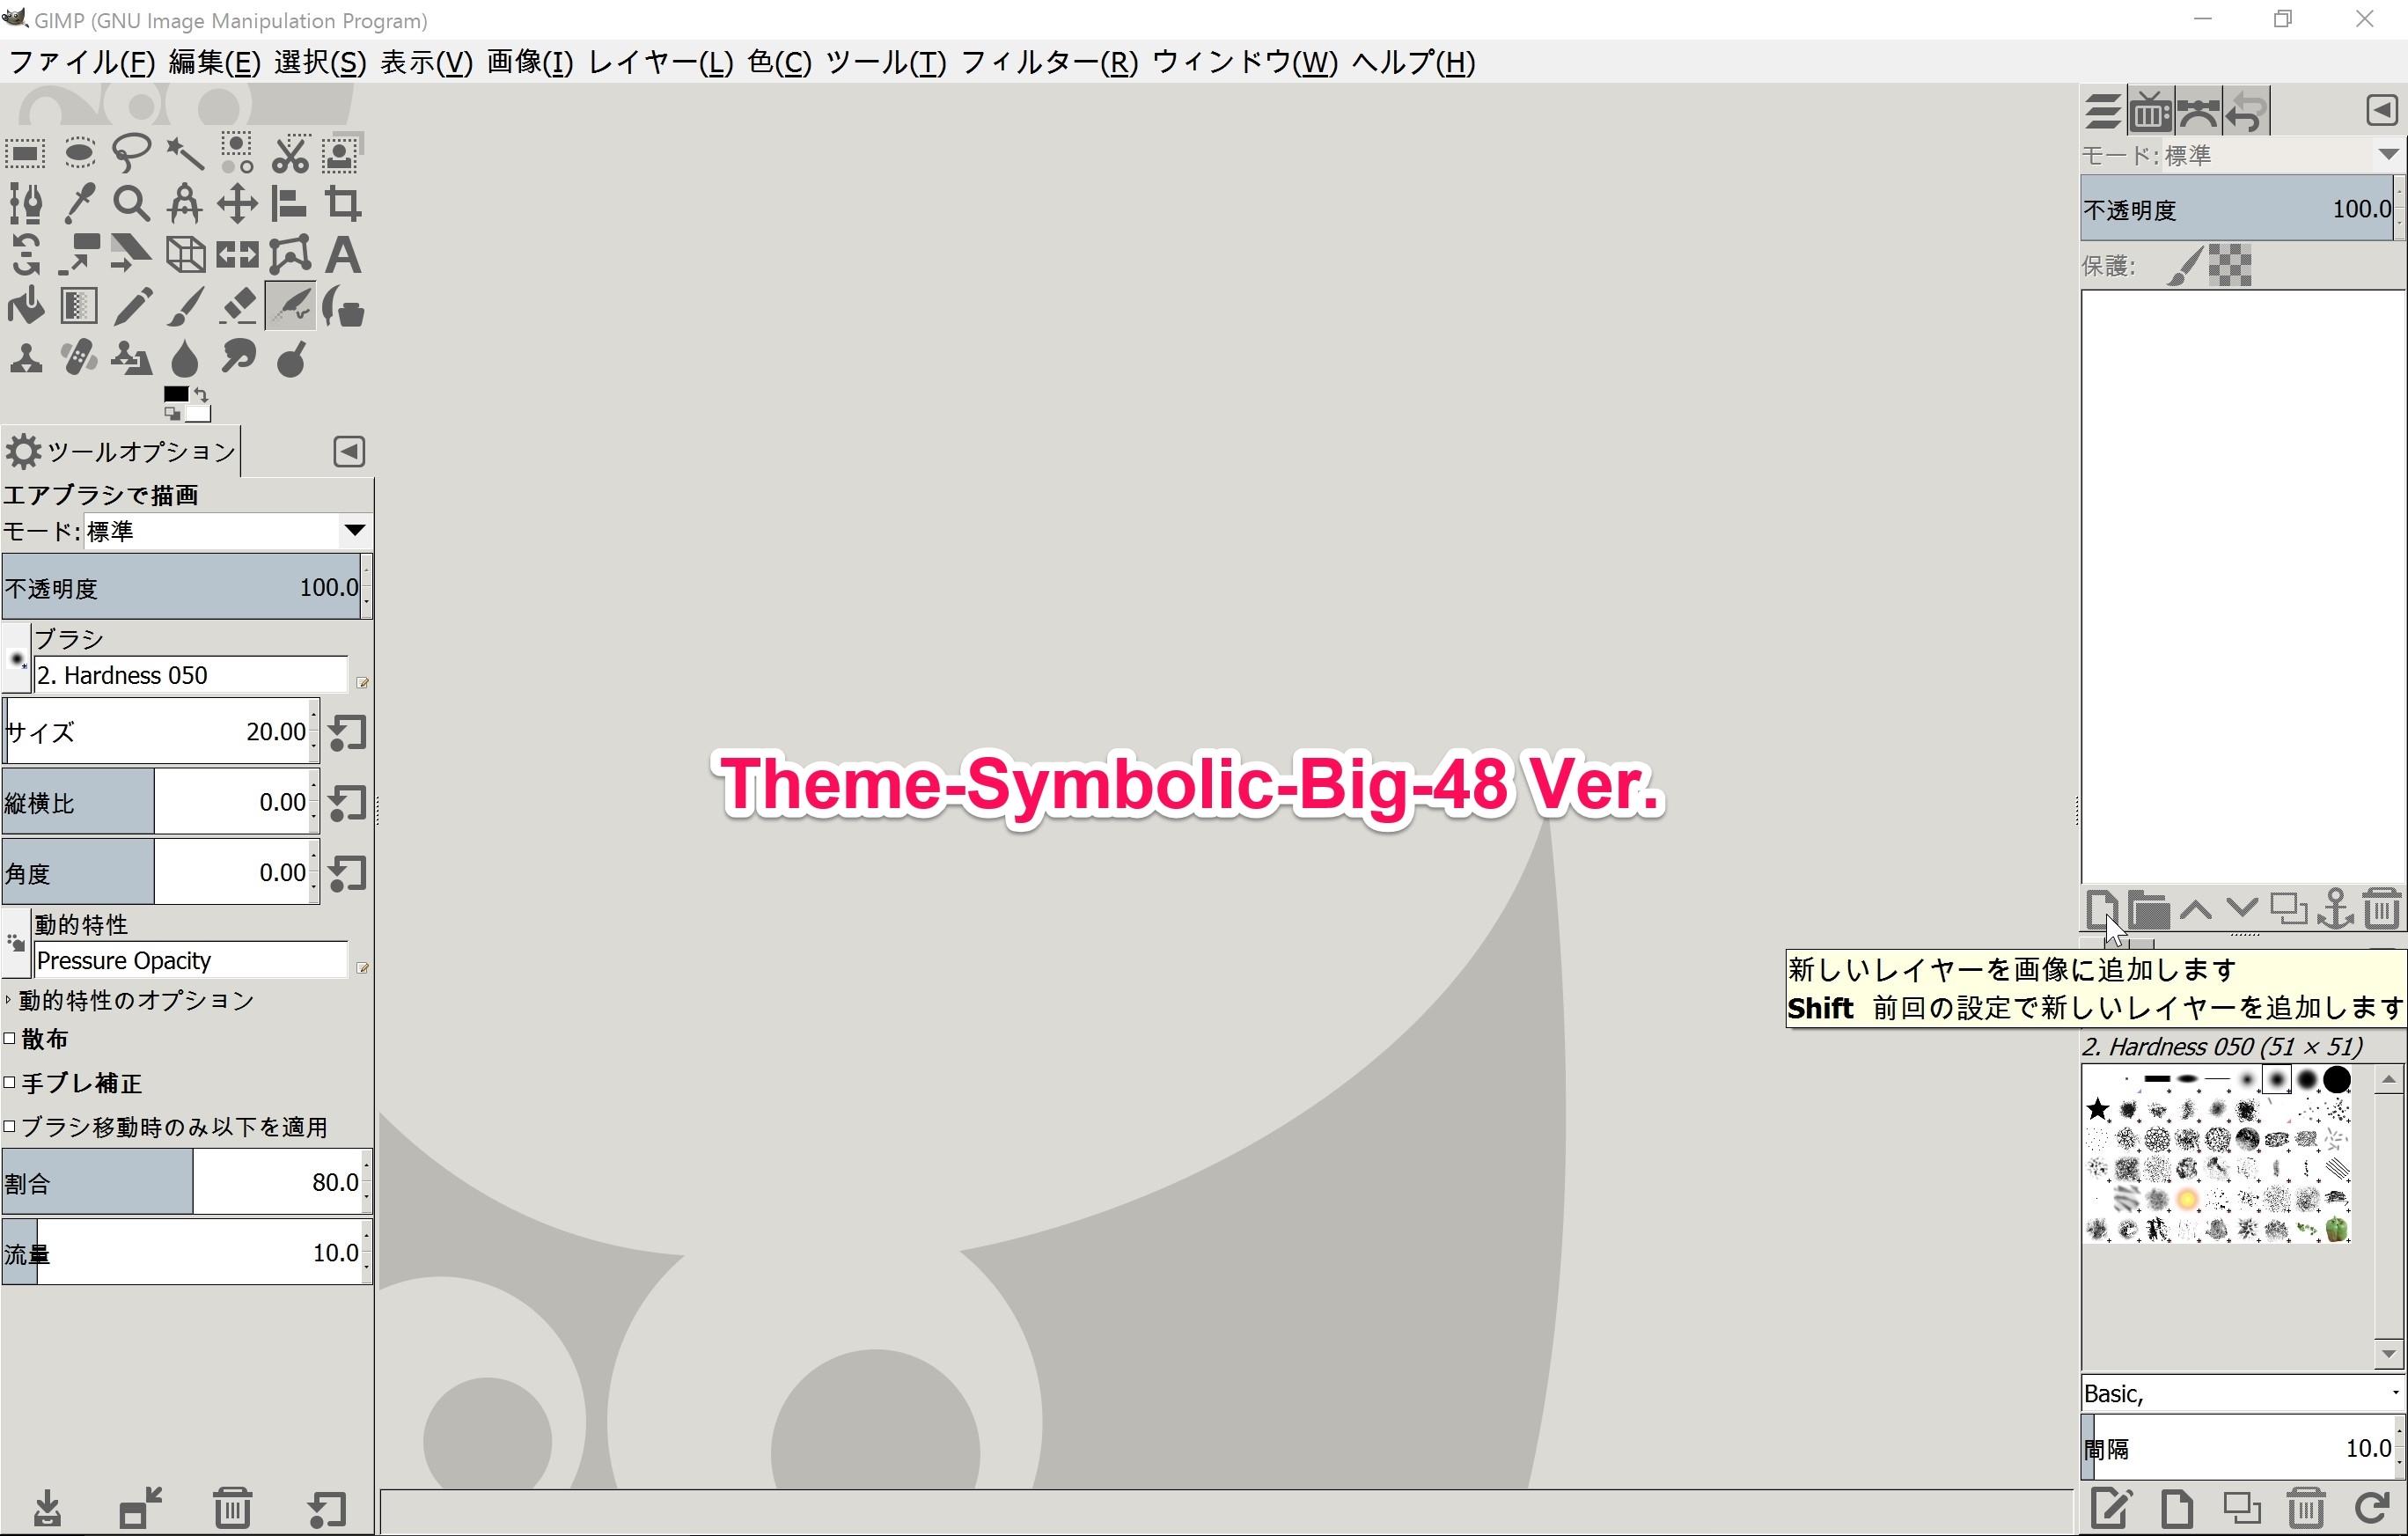 The 48x48 theme